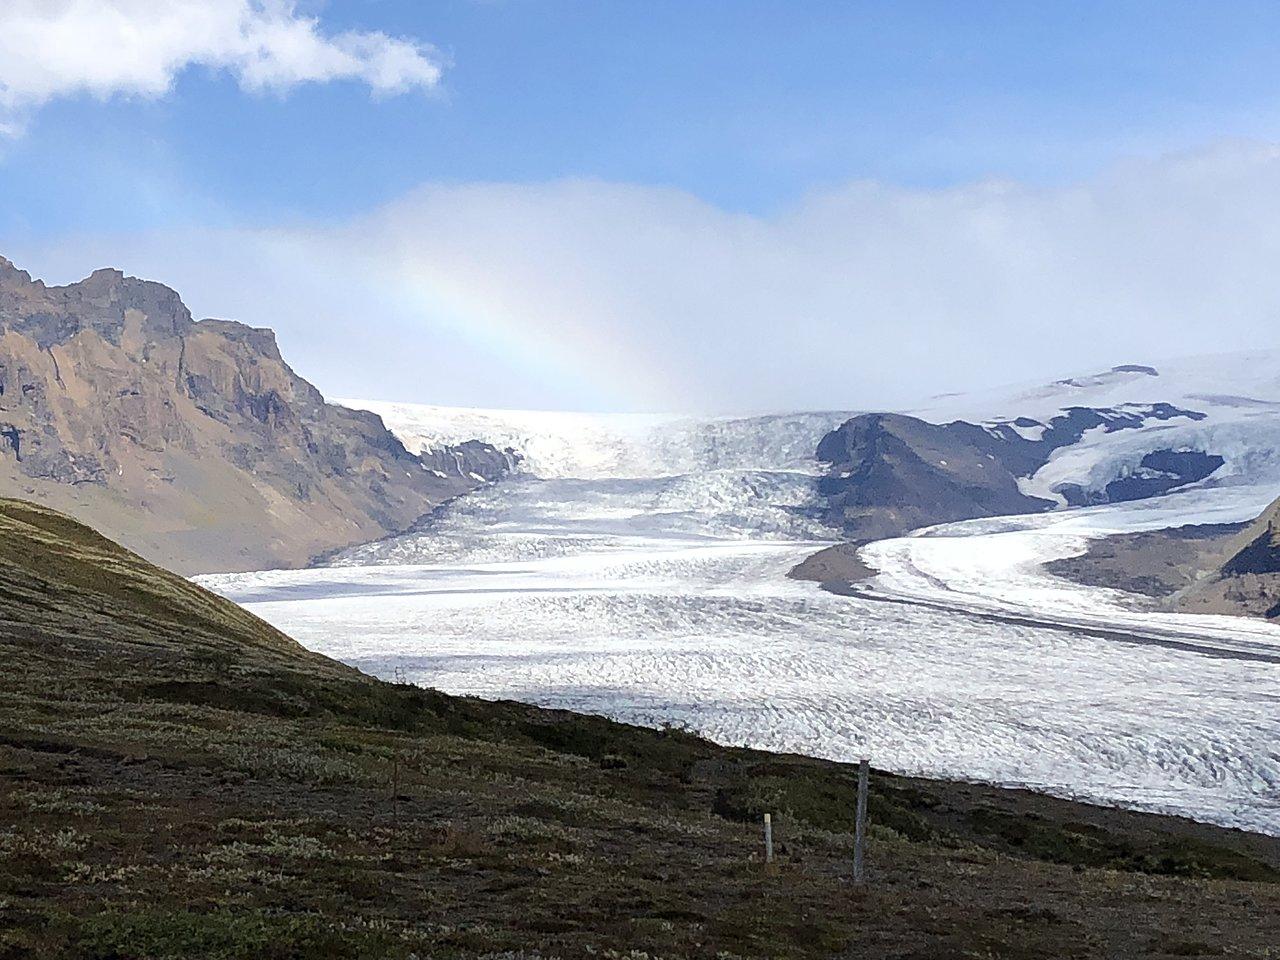 Vatnajokull National Park Glacier | Photo taken by Laura D